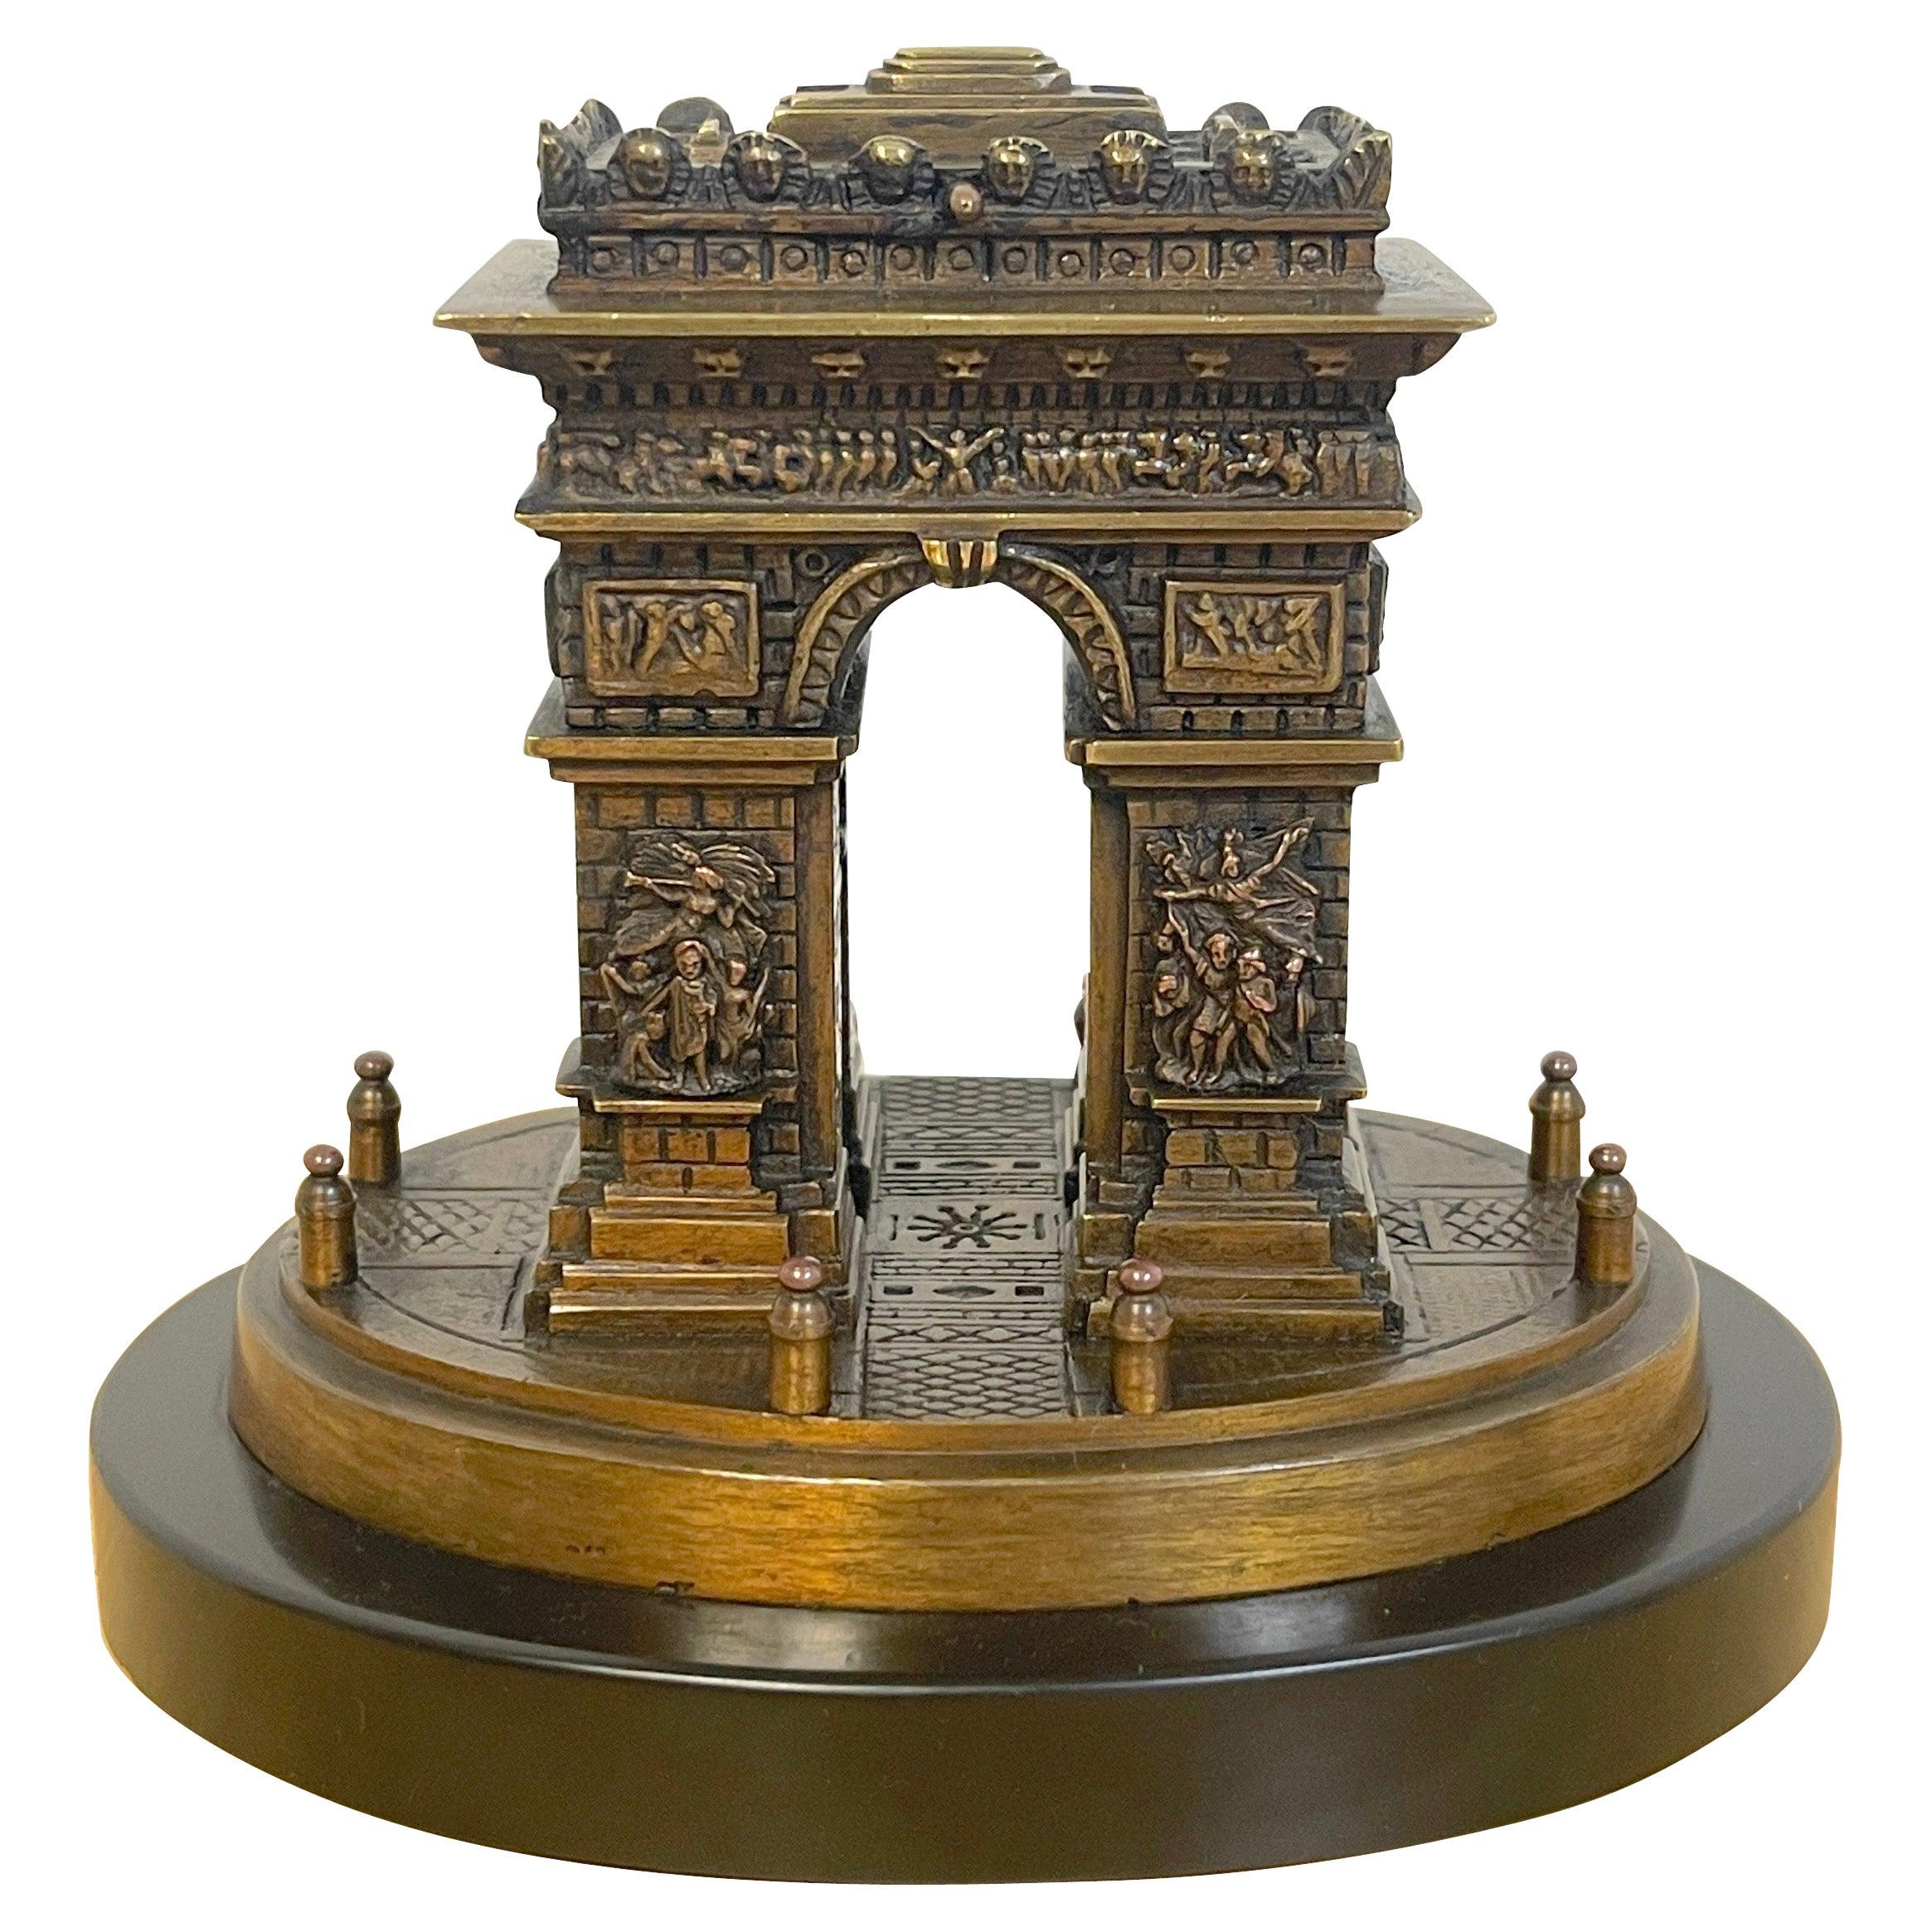 Diminutive Grand Tour Bronze Architectural Model of the Arch de Triumph